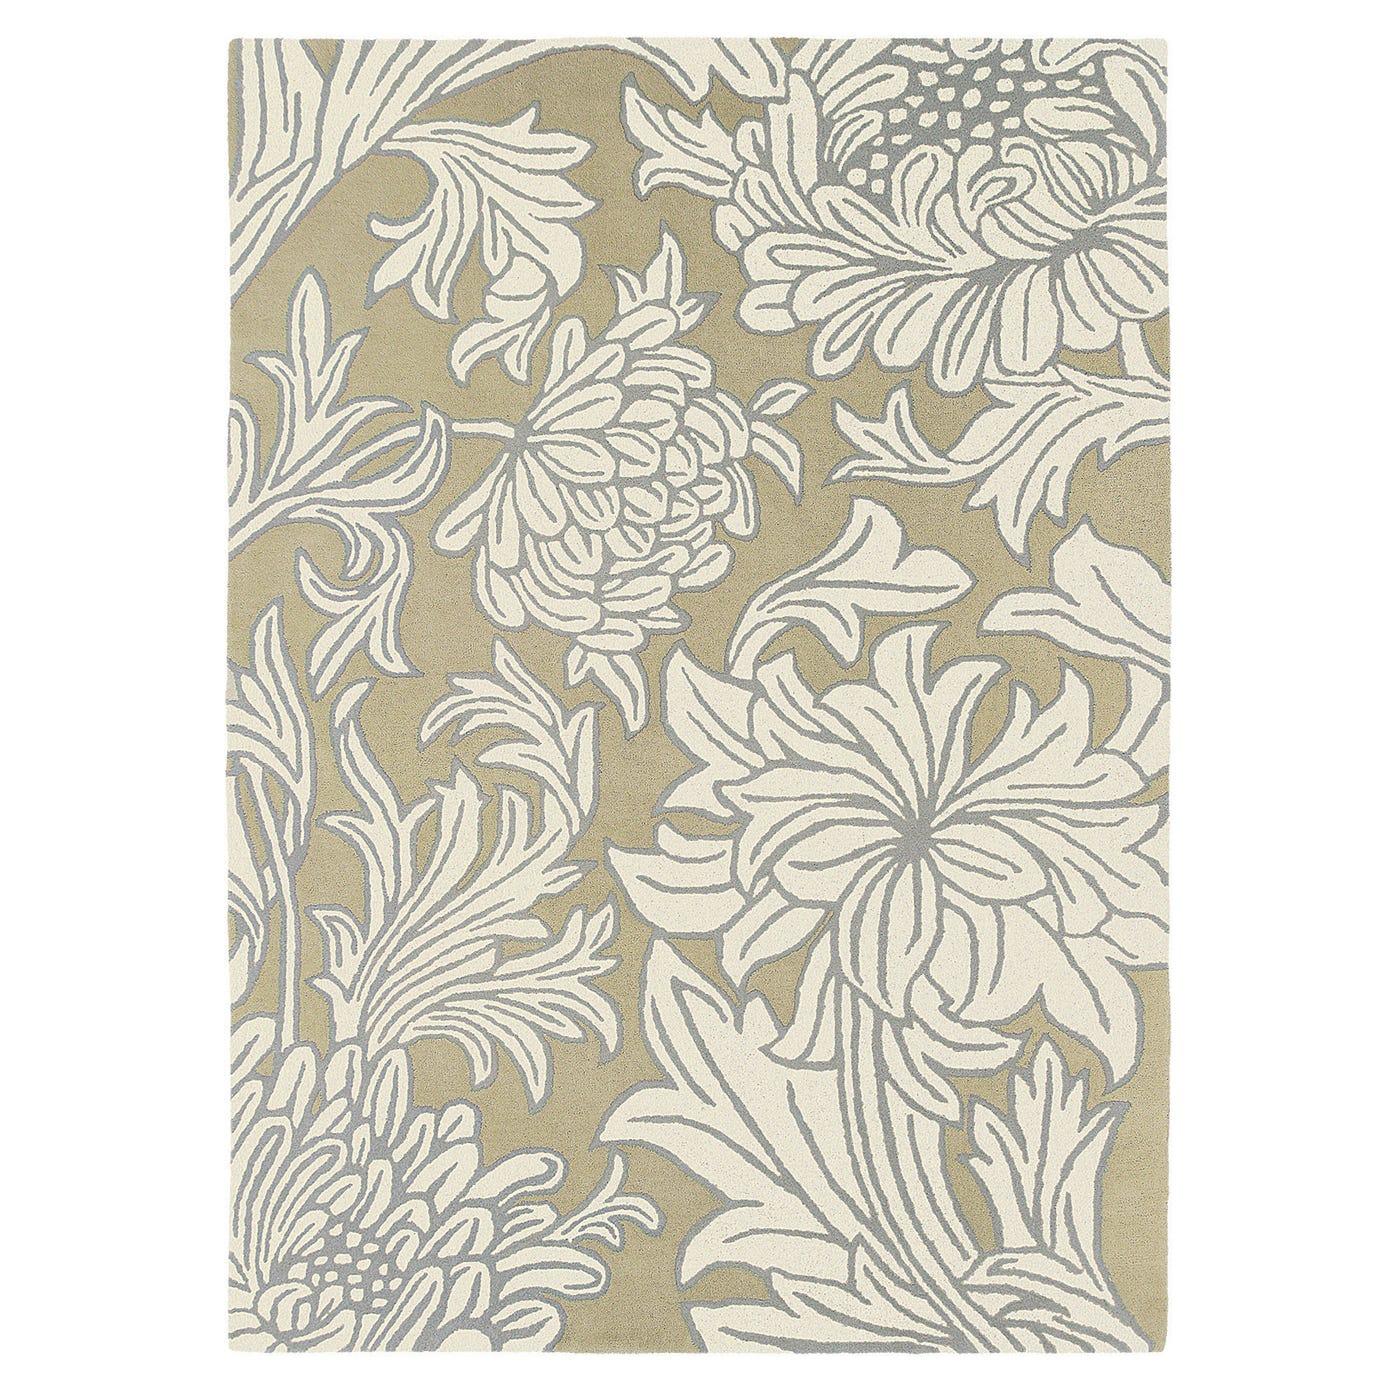 Morris & Co Chrysanthemum Rug 170 x 240cm Sisal